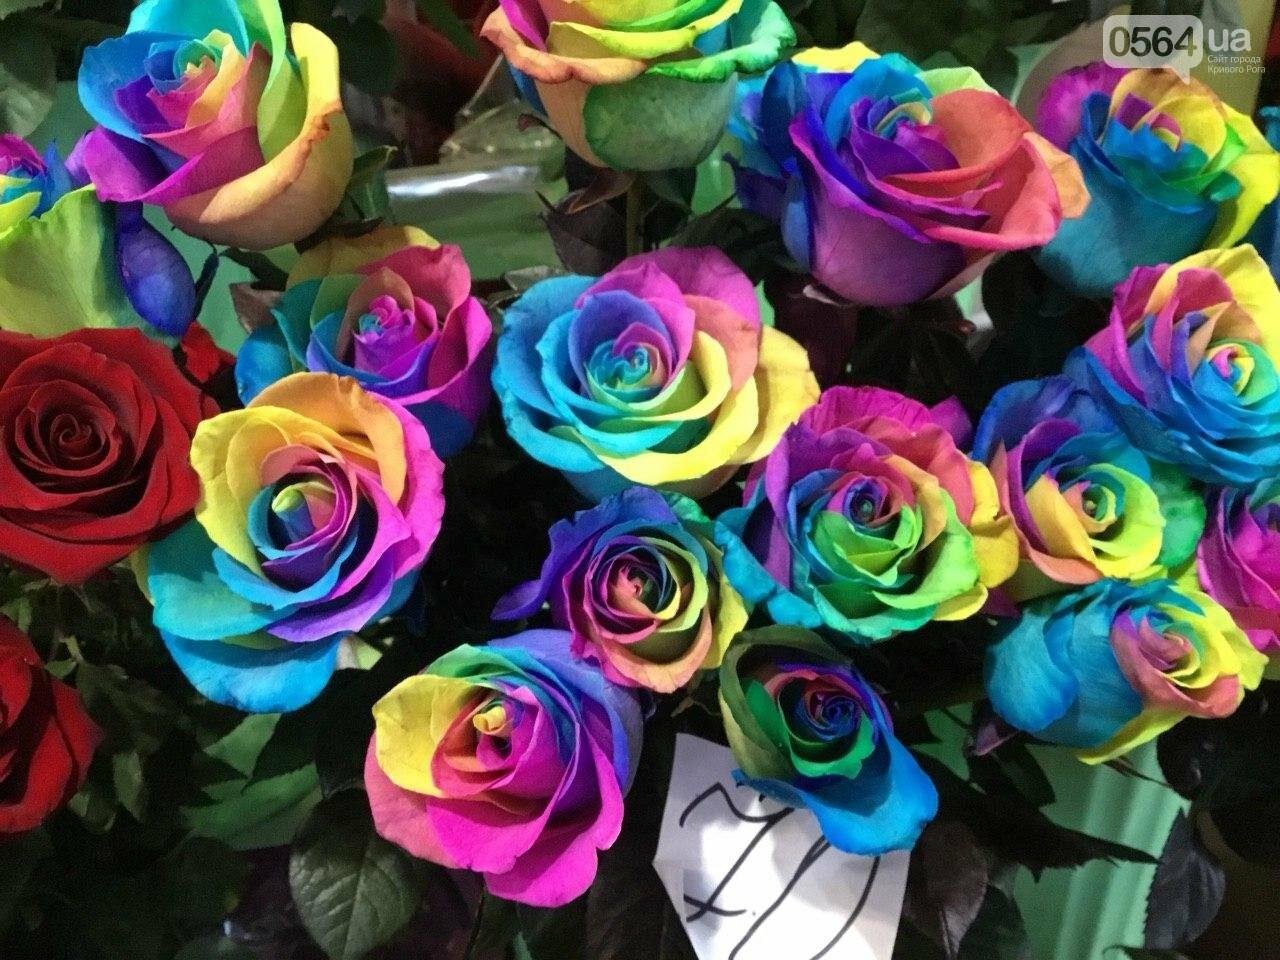 Сколько стоят примула, цикламен, мимоза? Обзор цен на цветы в Кривом Роге, - ФОТО, ВИДЕО, фото-1